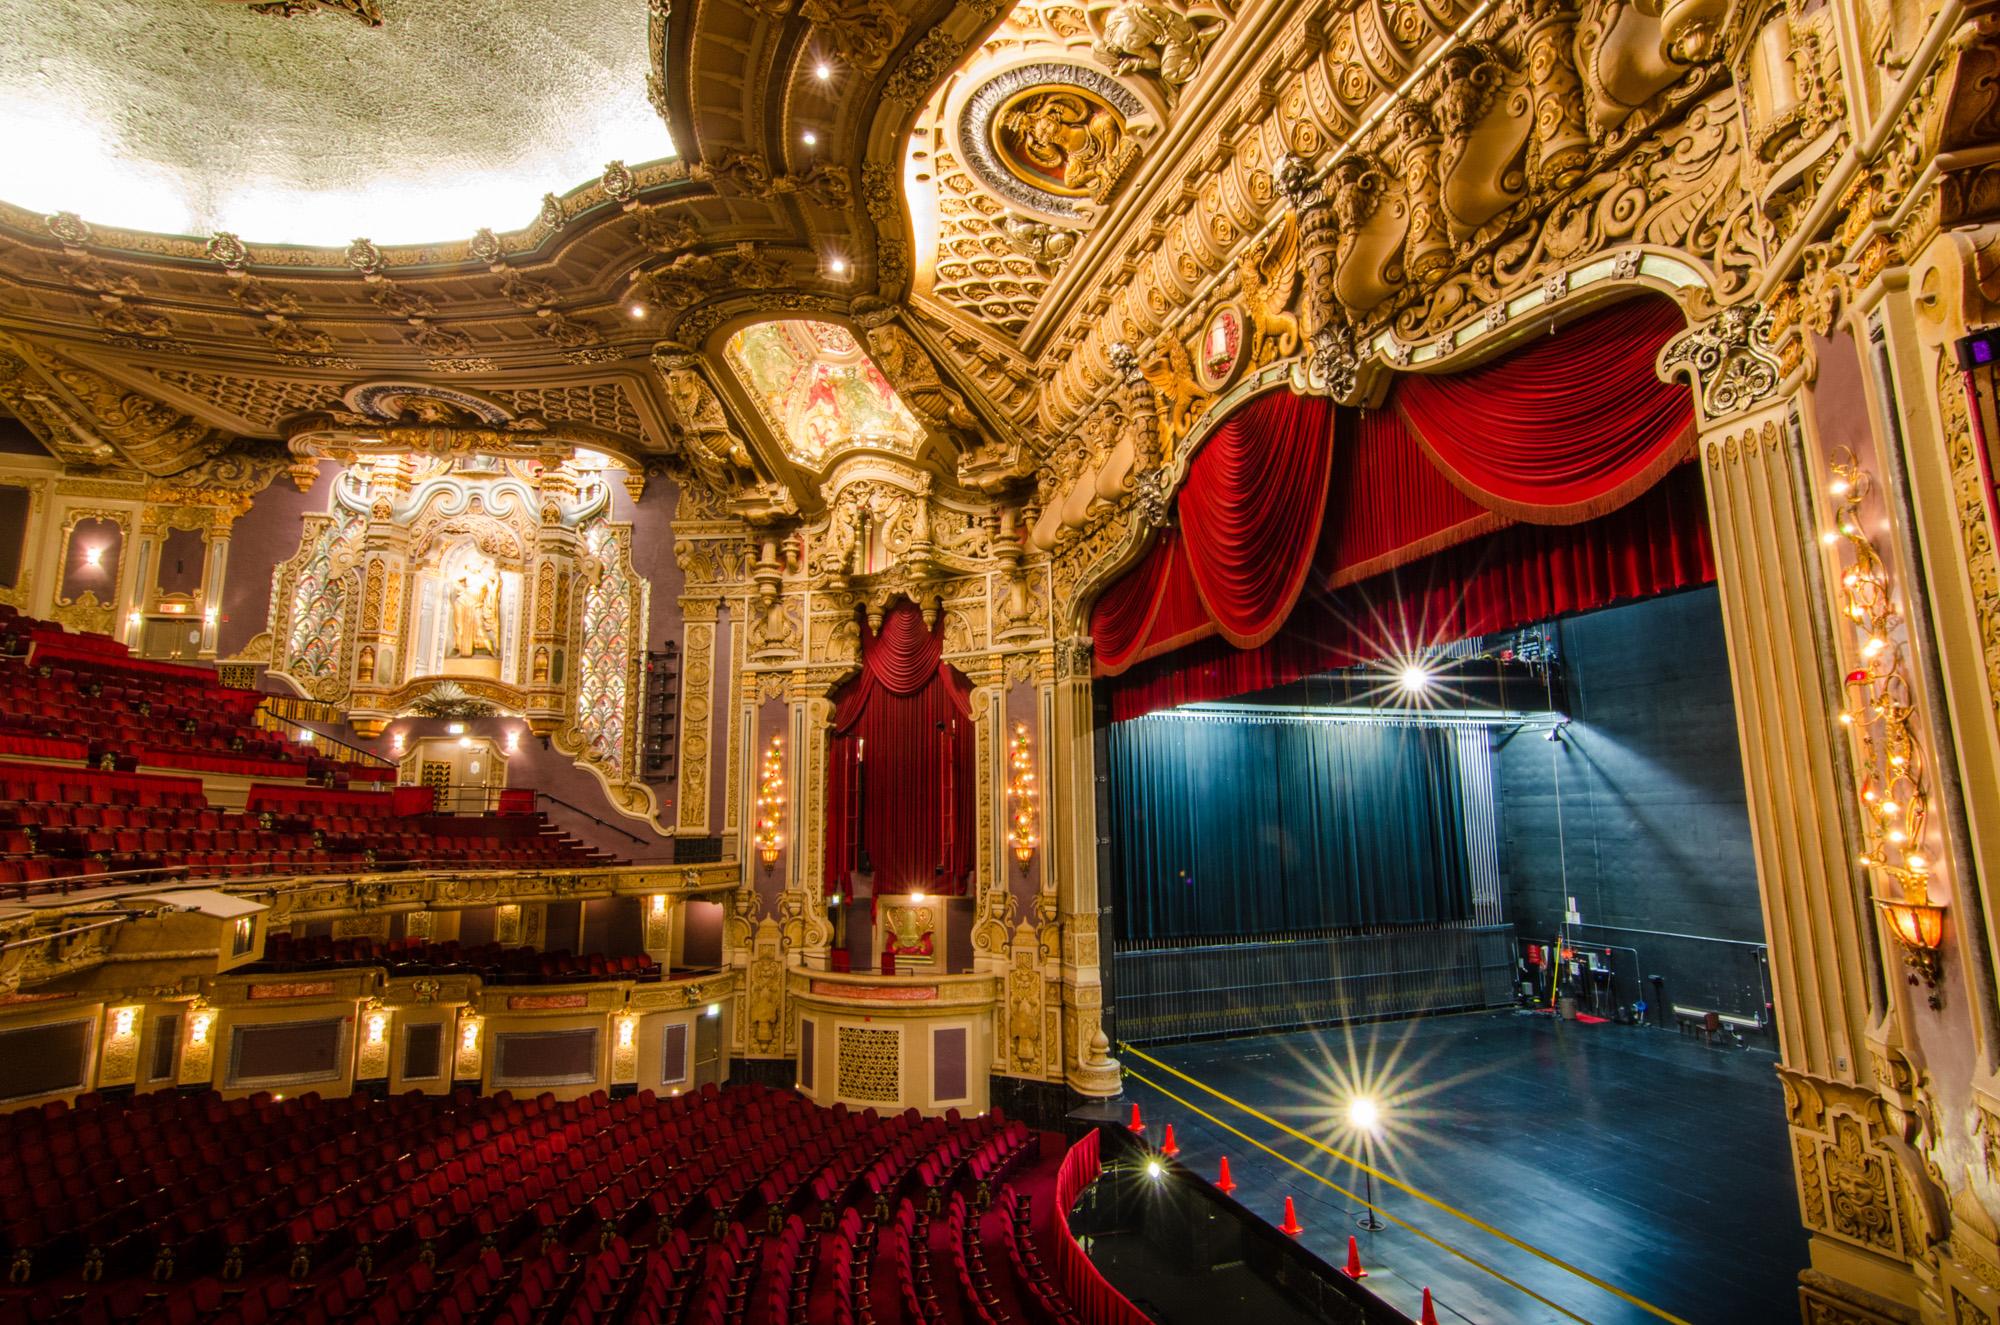 Broadway in Chicago's Oriental Theatre